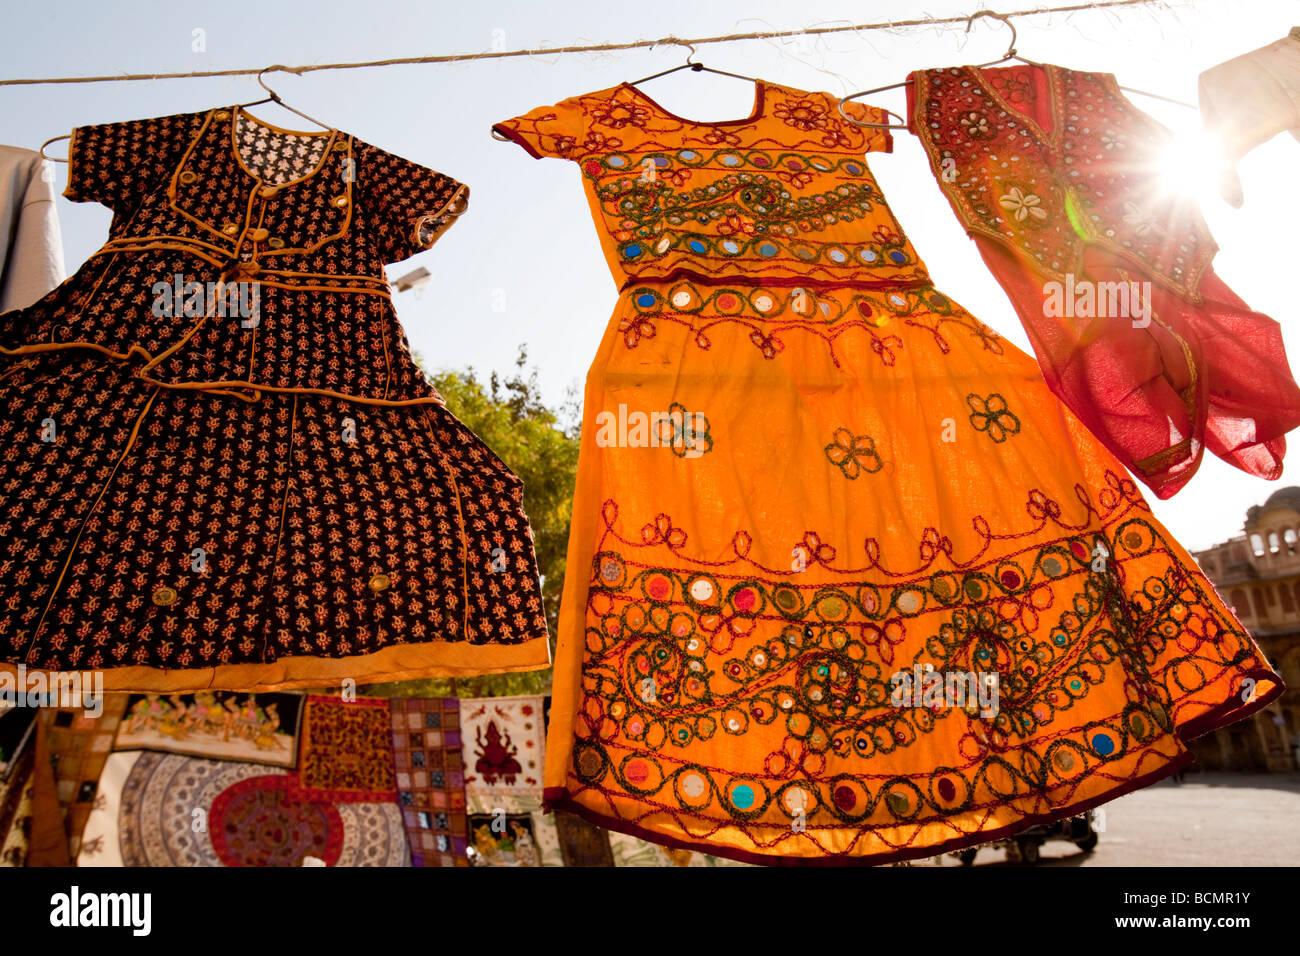 Abiti per la vendita nel mercato Sadar Jodhpur Rajasthan in India Immagini Stock